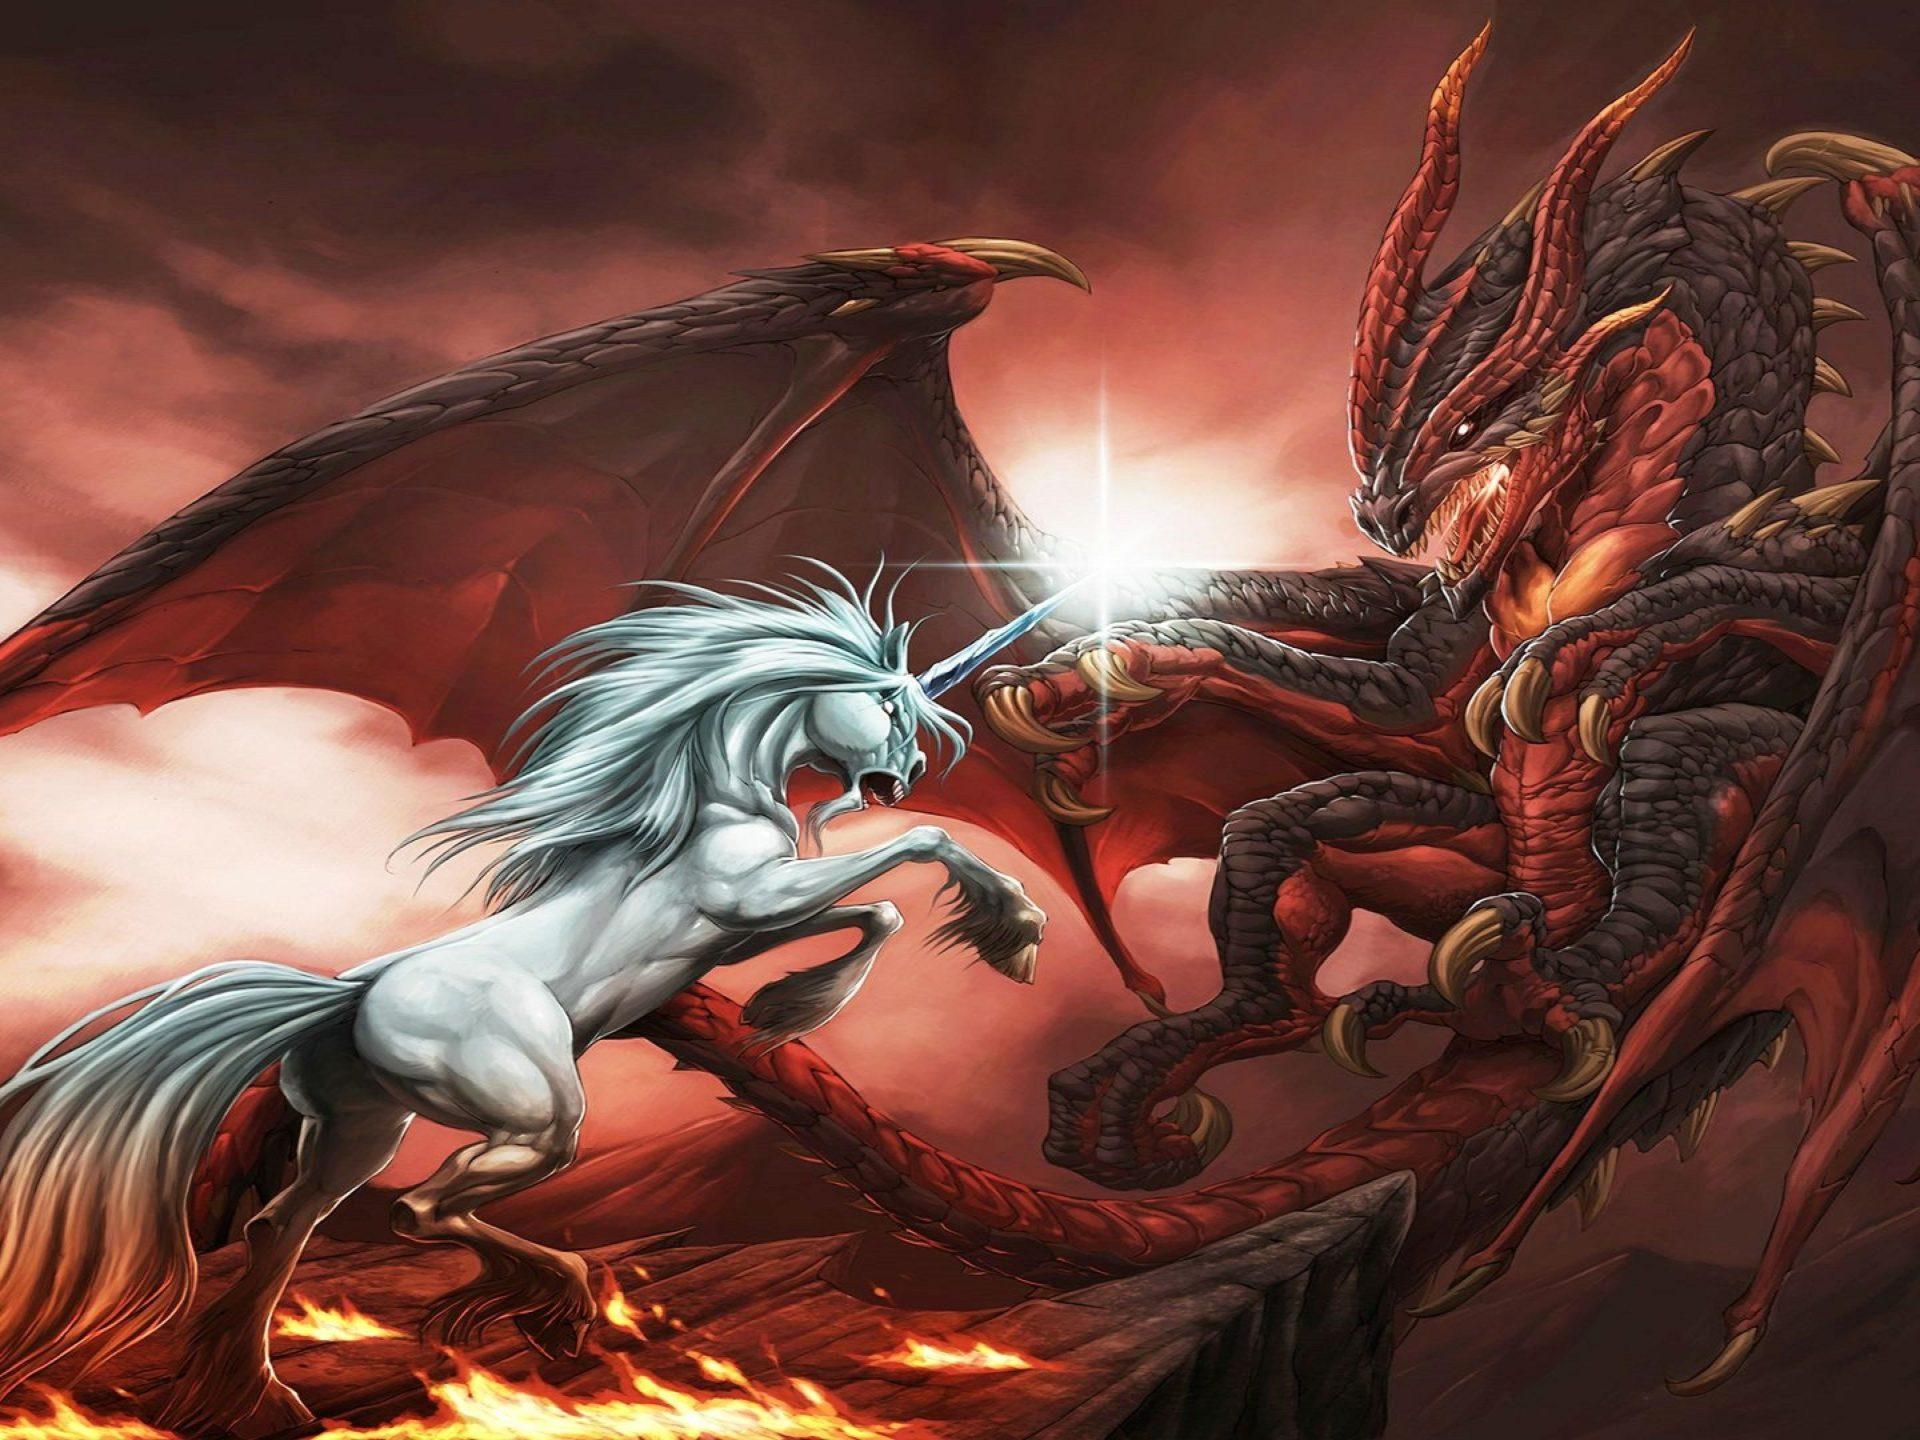 Hd Wallpaper Beach Girl Fantasy Dragon Unicorn War Abstract Ultra 3840x2160 Hd